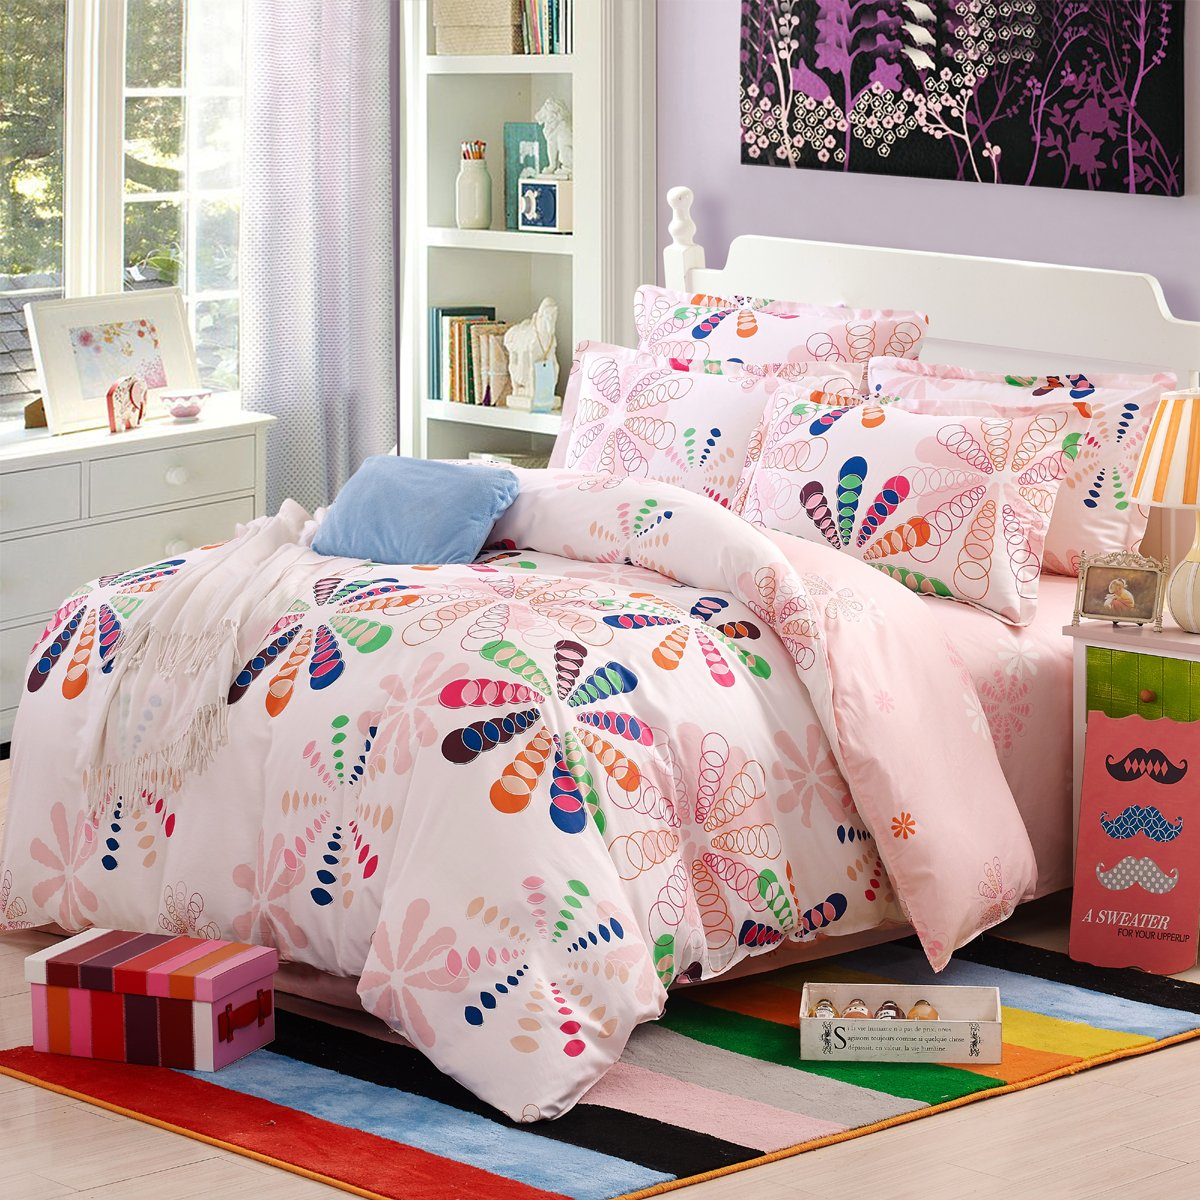 YOTA Xingyueウサギ綿ツイルプリント4ピース高層高密度ABバージョンデザイン1.5 / 1.8 mベッド(200 * 230 cm)7色花